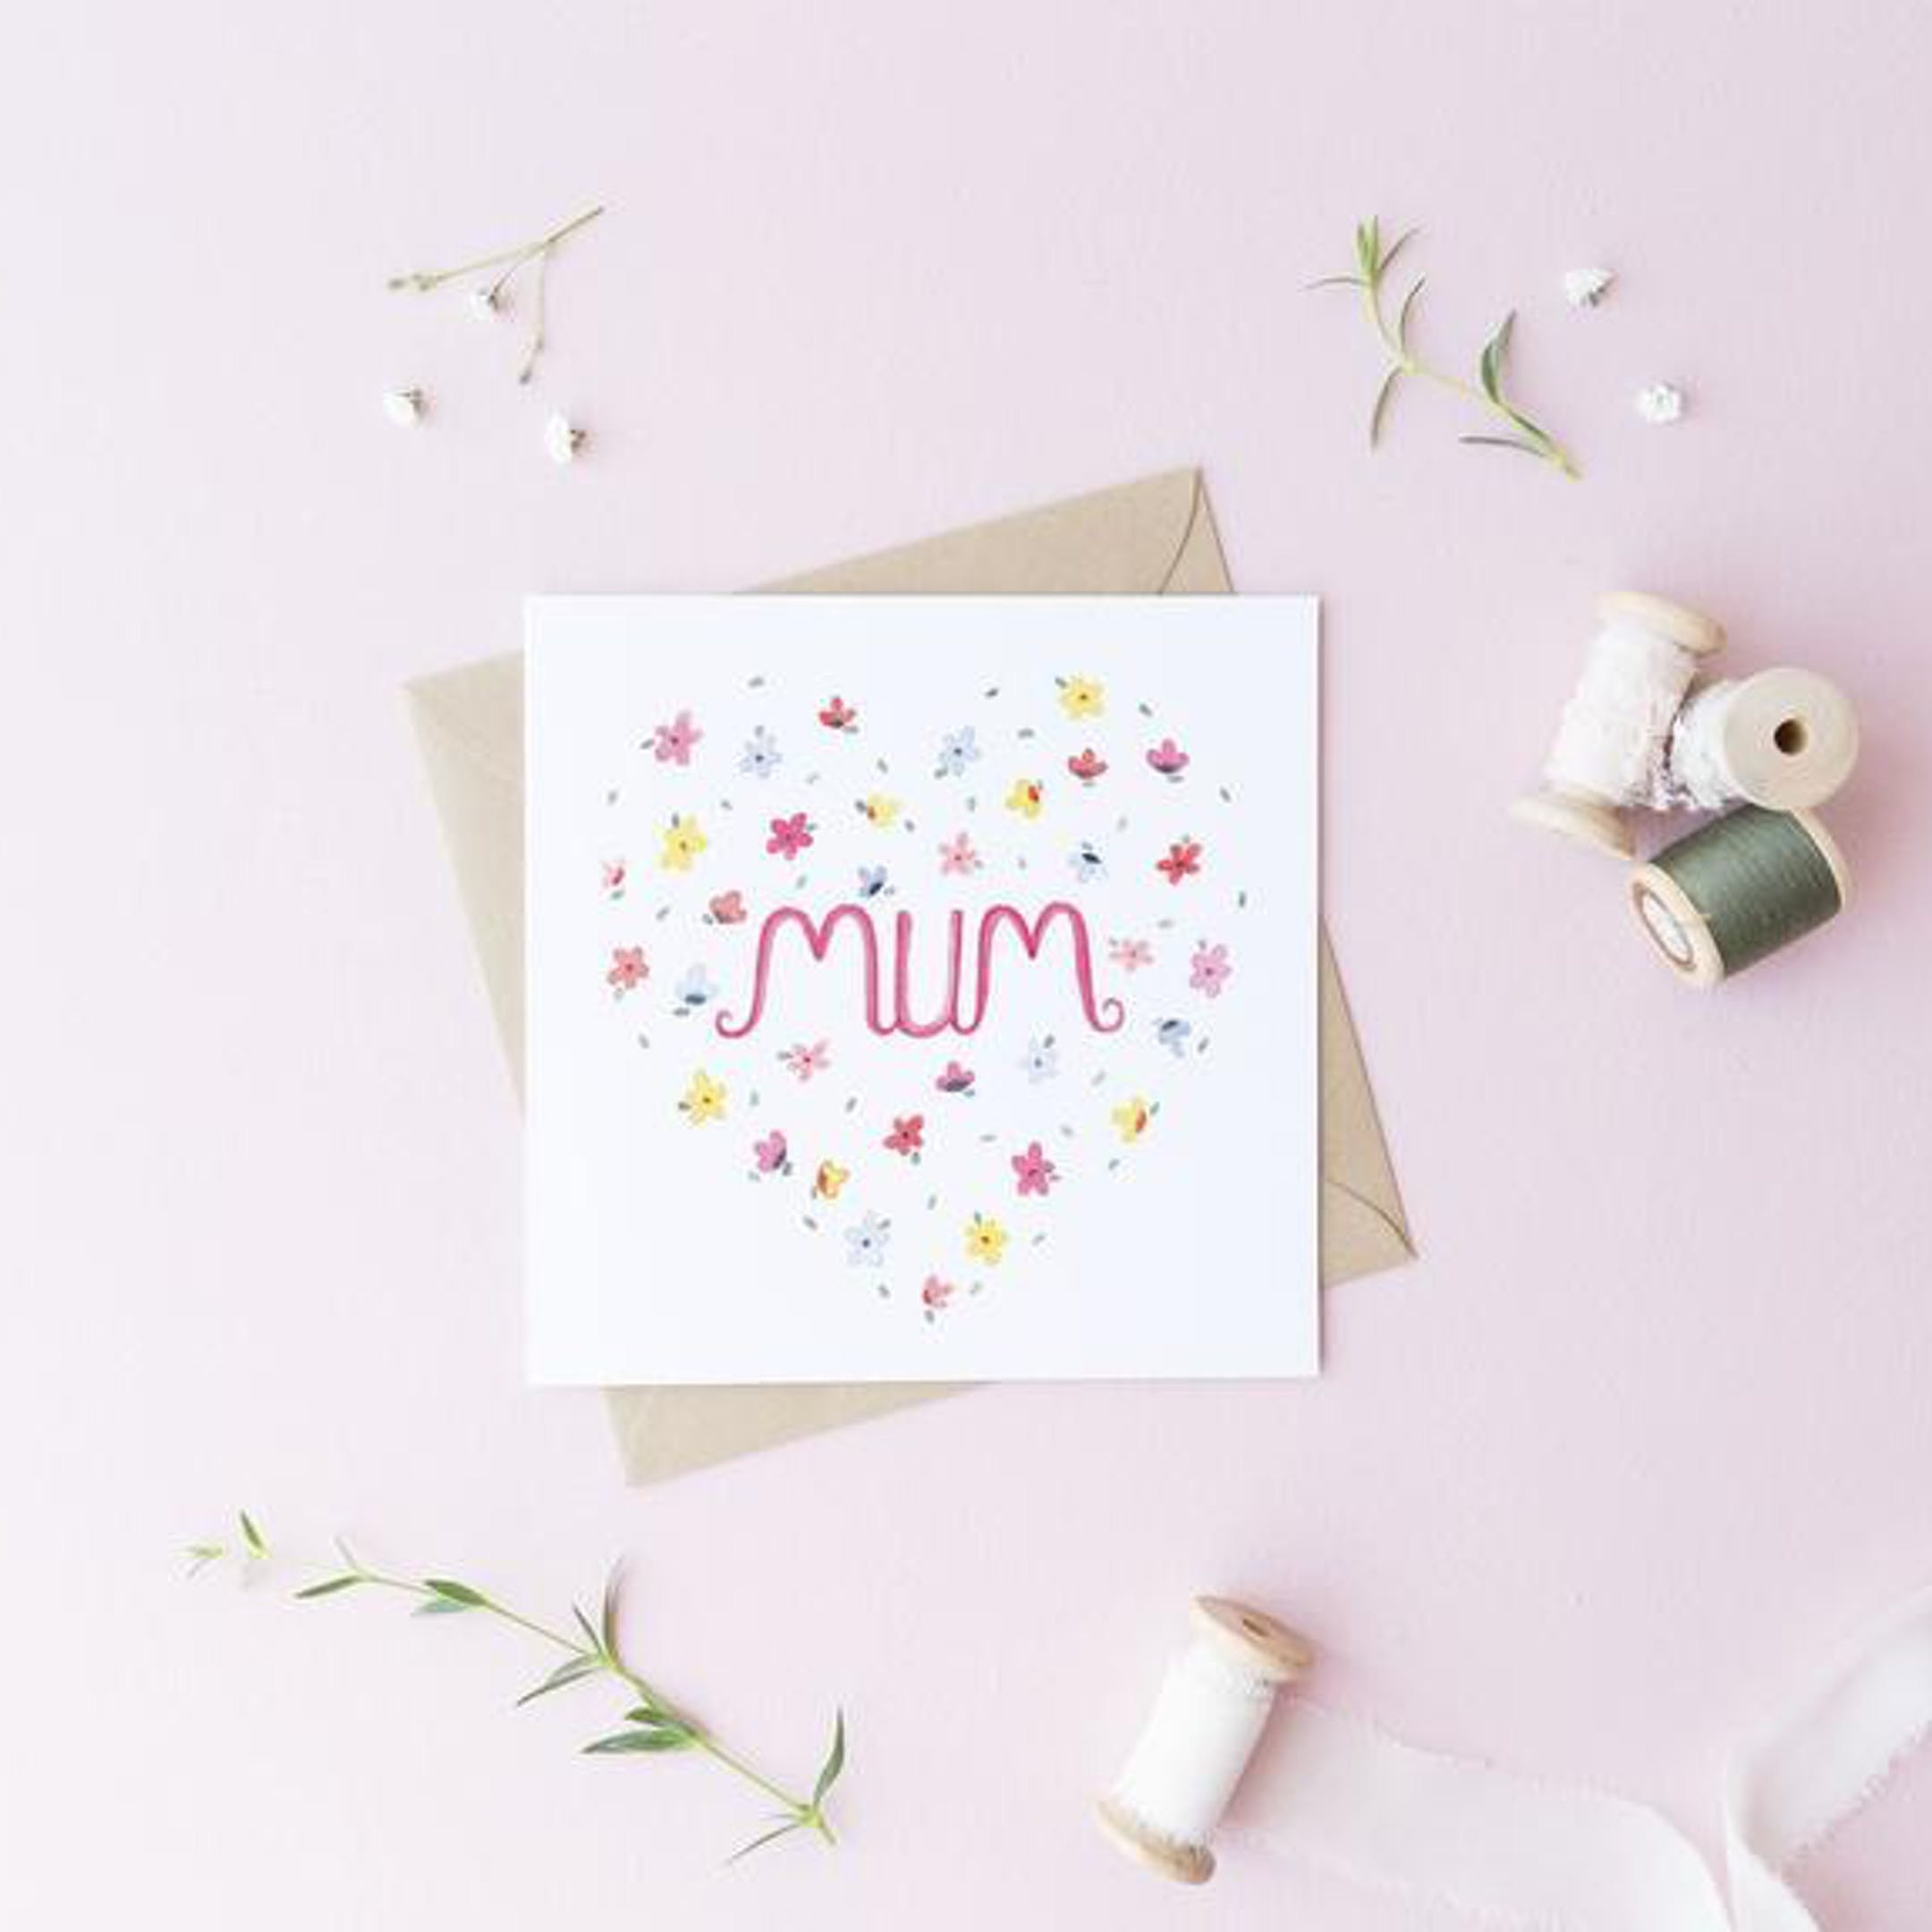 Mum Card | Treasured Creativity | Cheerfully Given - Christian Cards UK